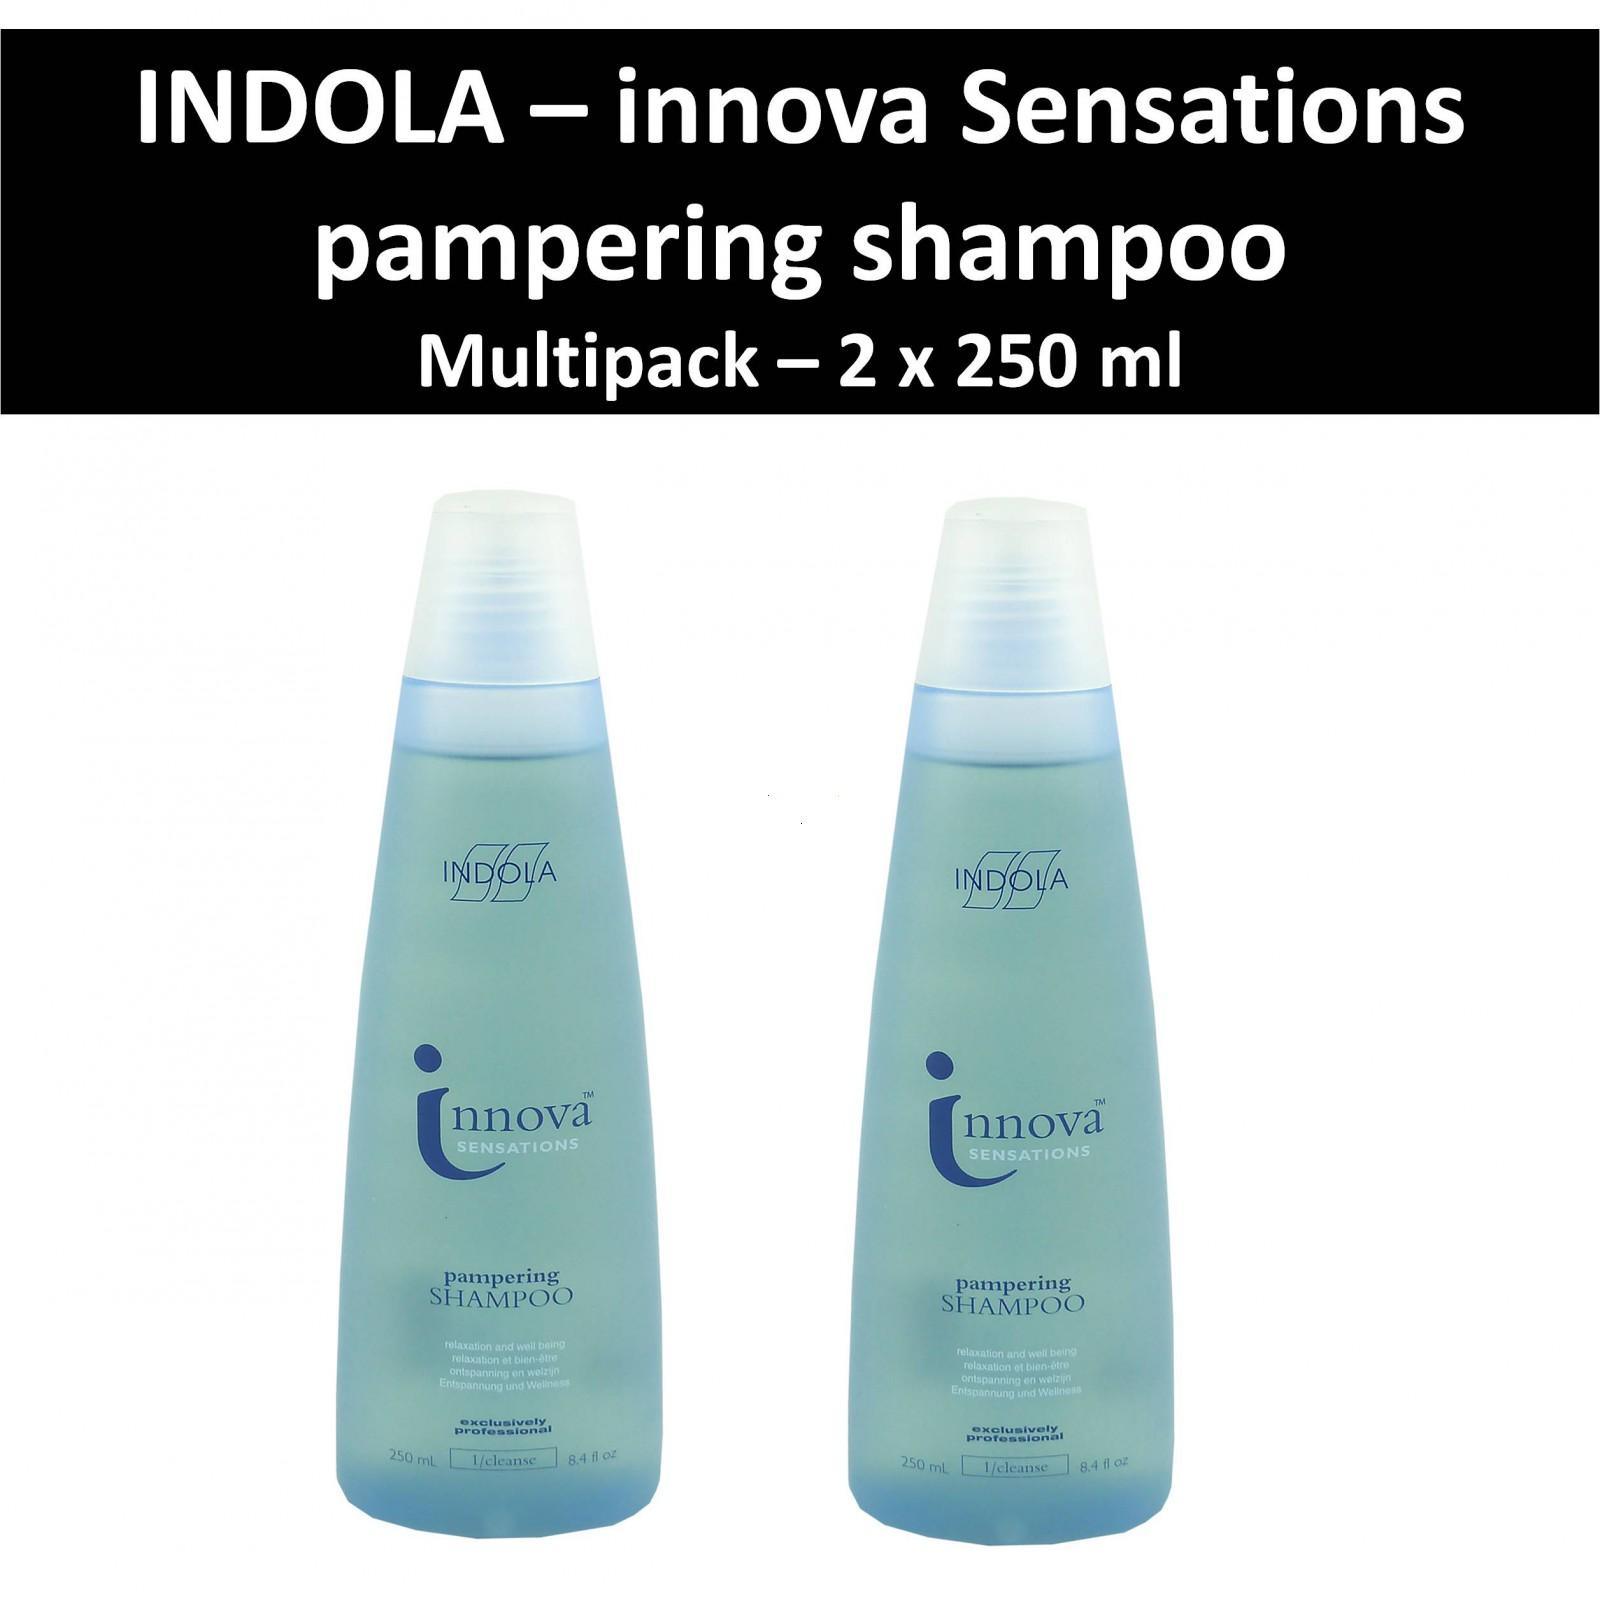 Indola - Innova Sensations - Pampering Shampoo - Haar Pflege Wäsche - 2x250 ml